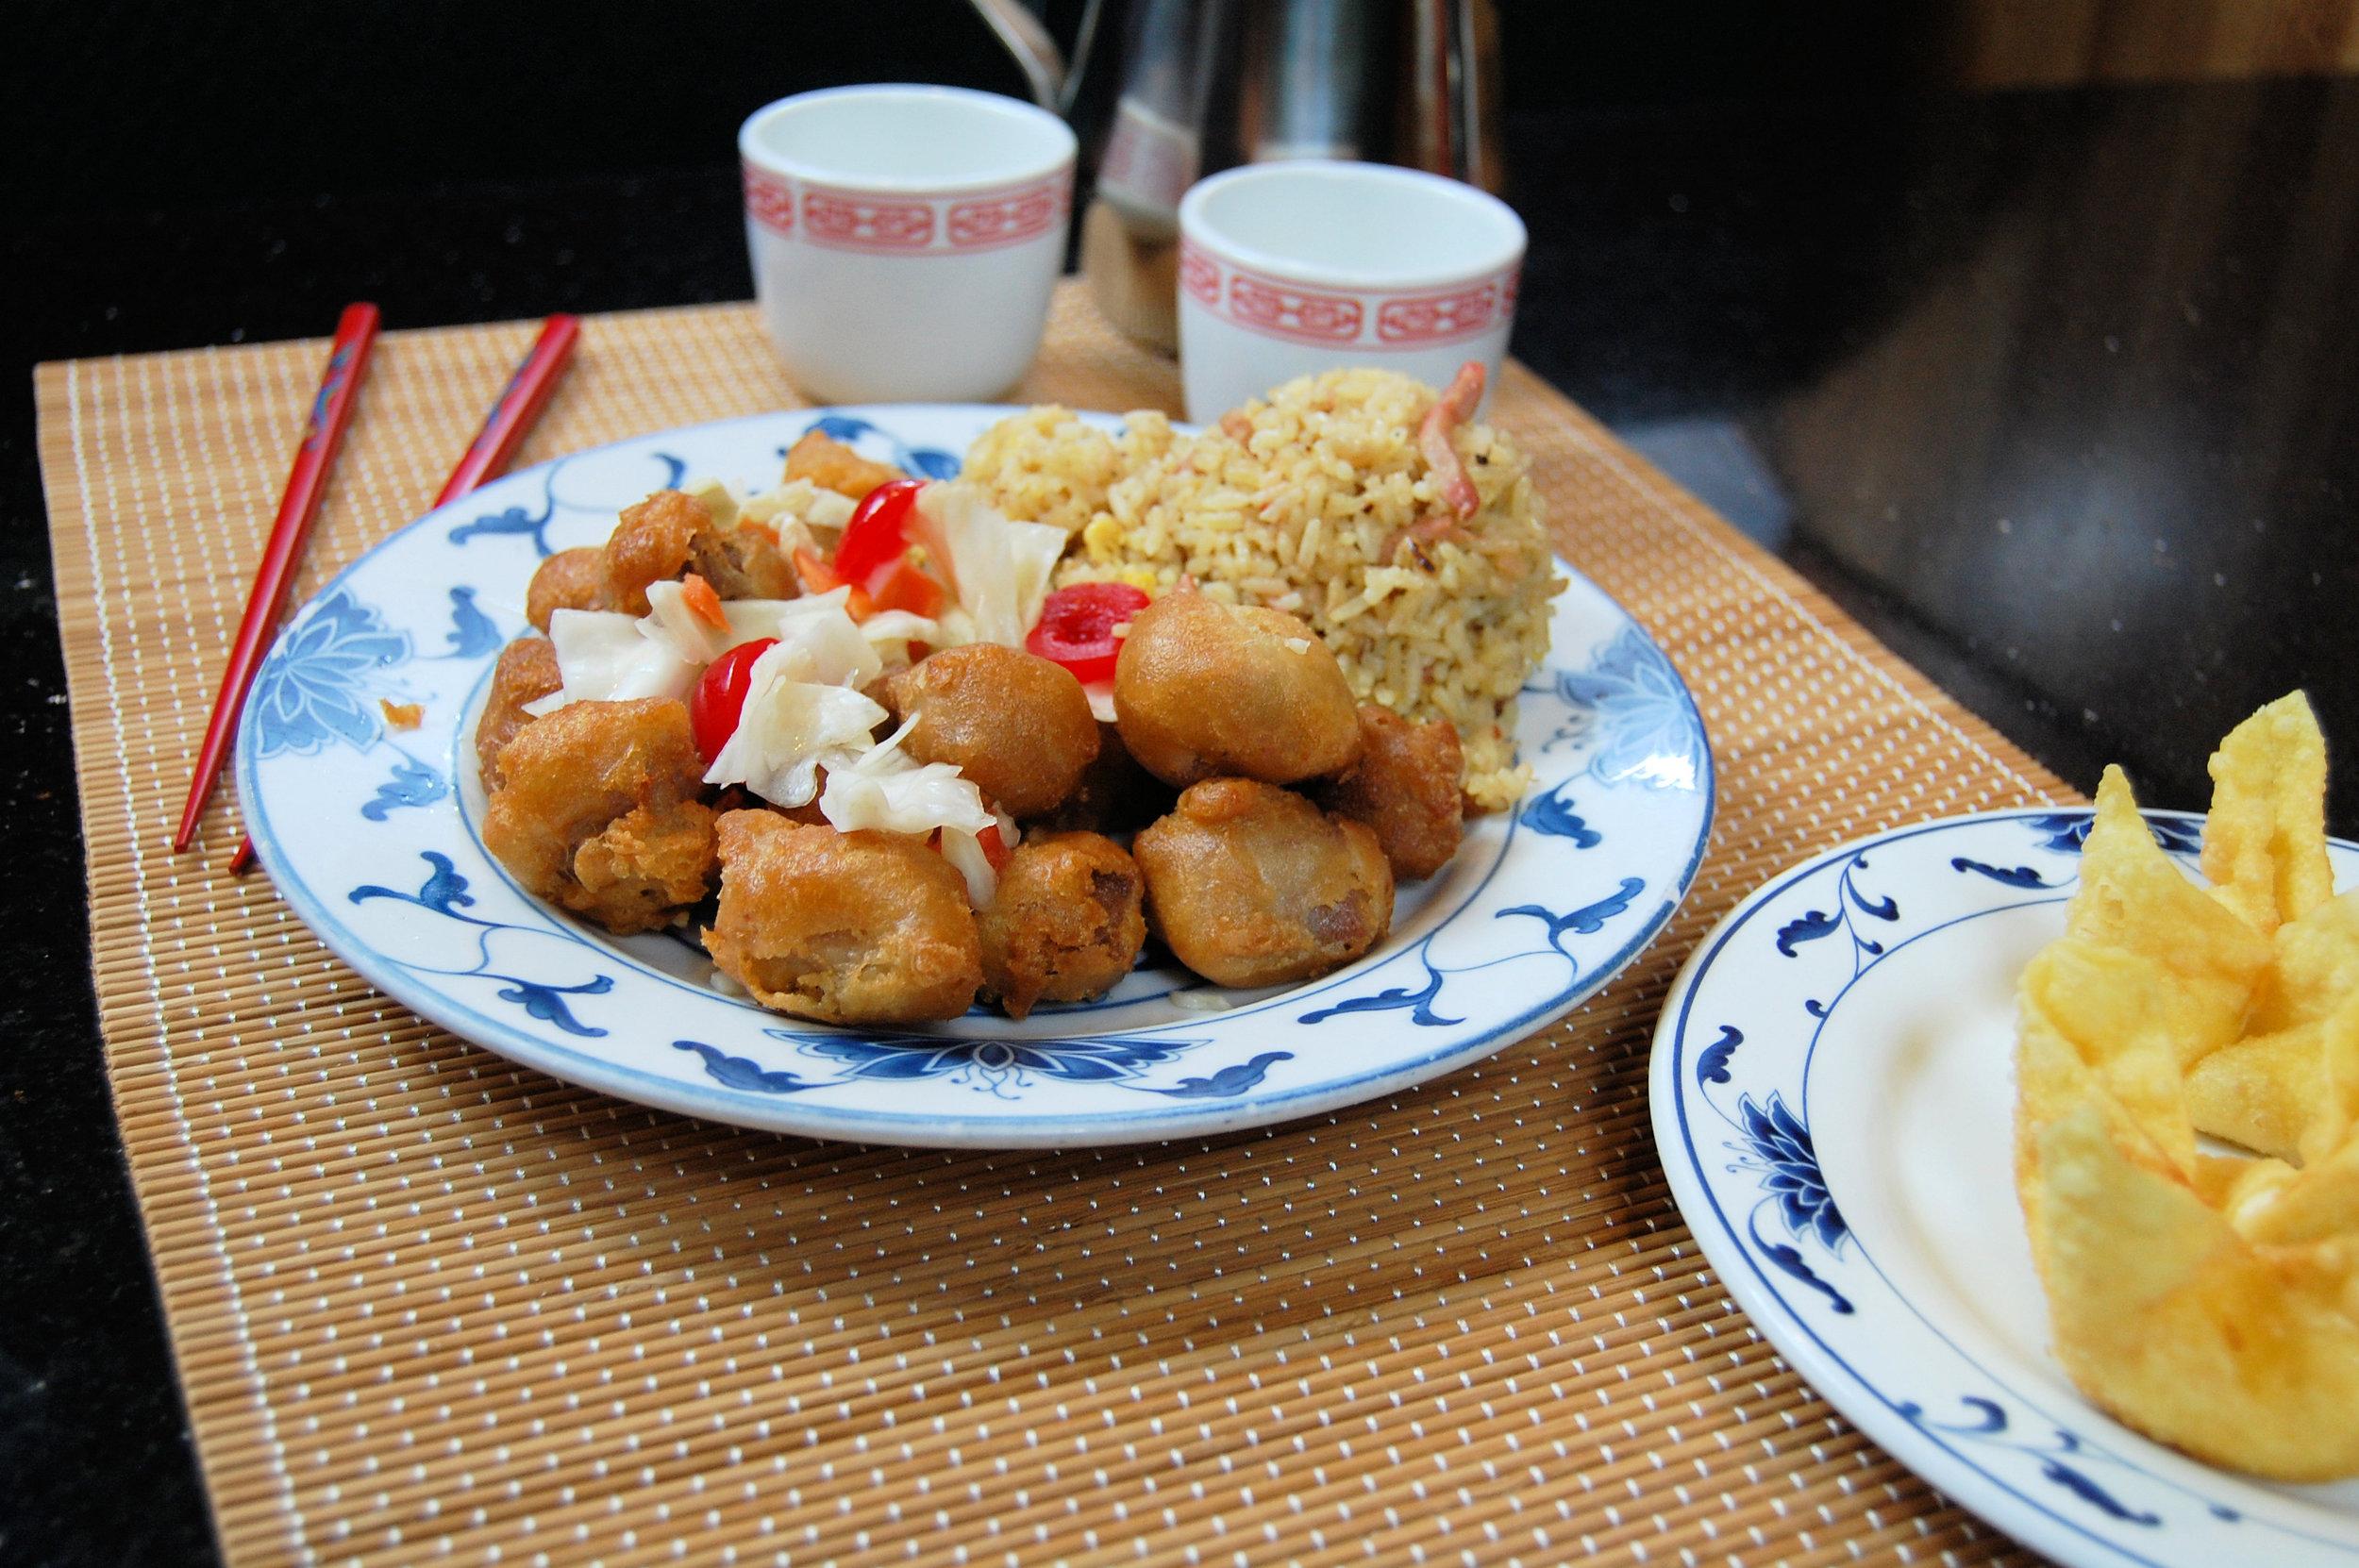 DSC_0477 Sweet and Sour Pork with Crab Rangoon.JPG